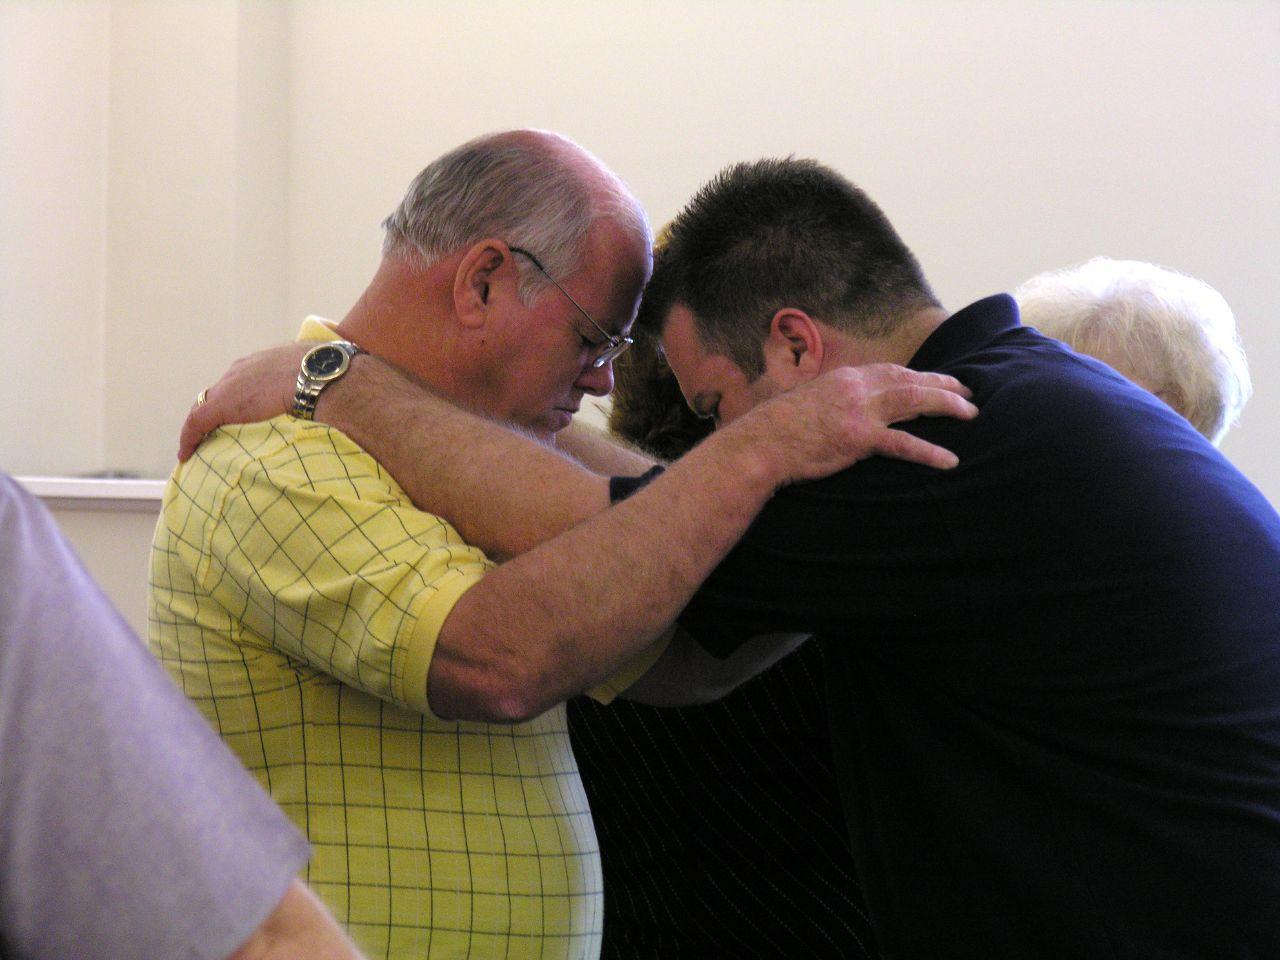 prayer the rock church music flickr photo sharing